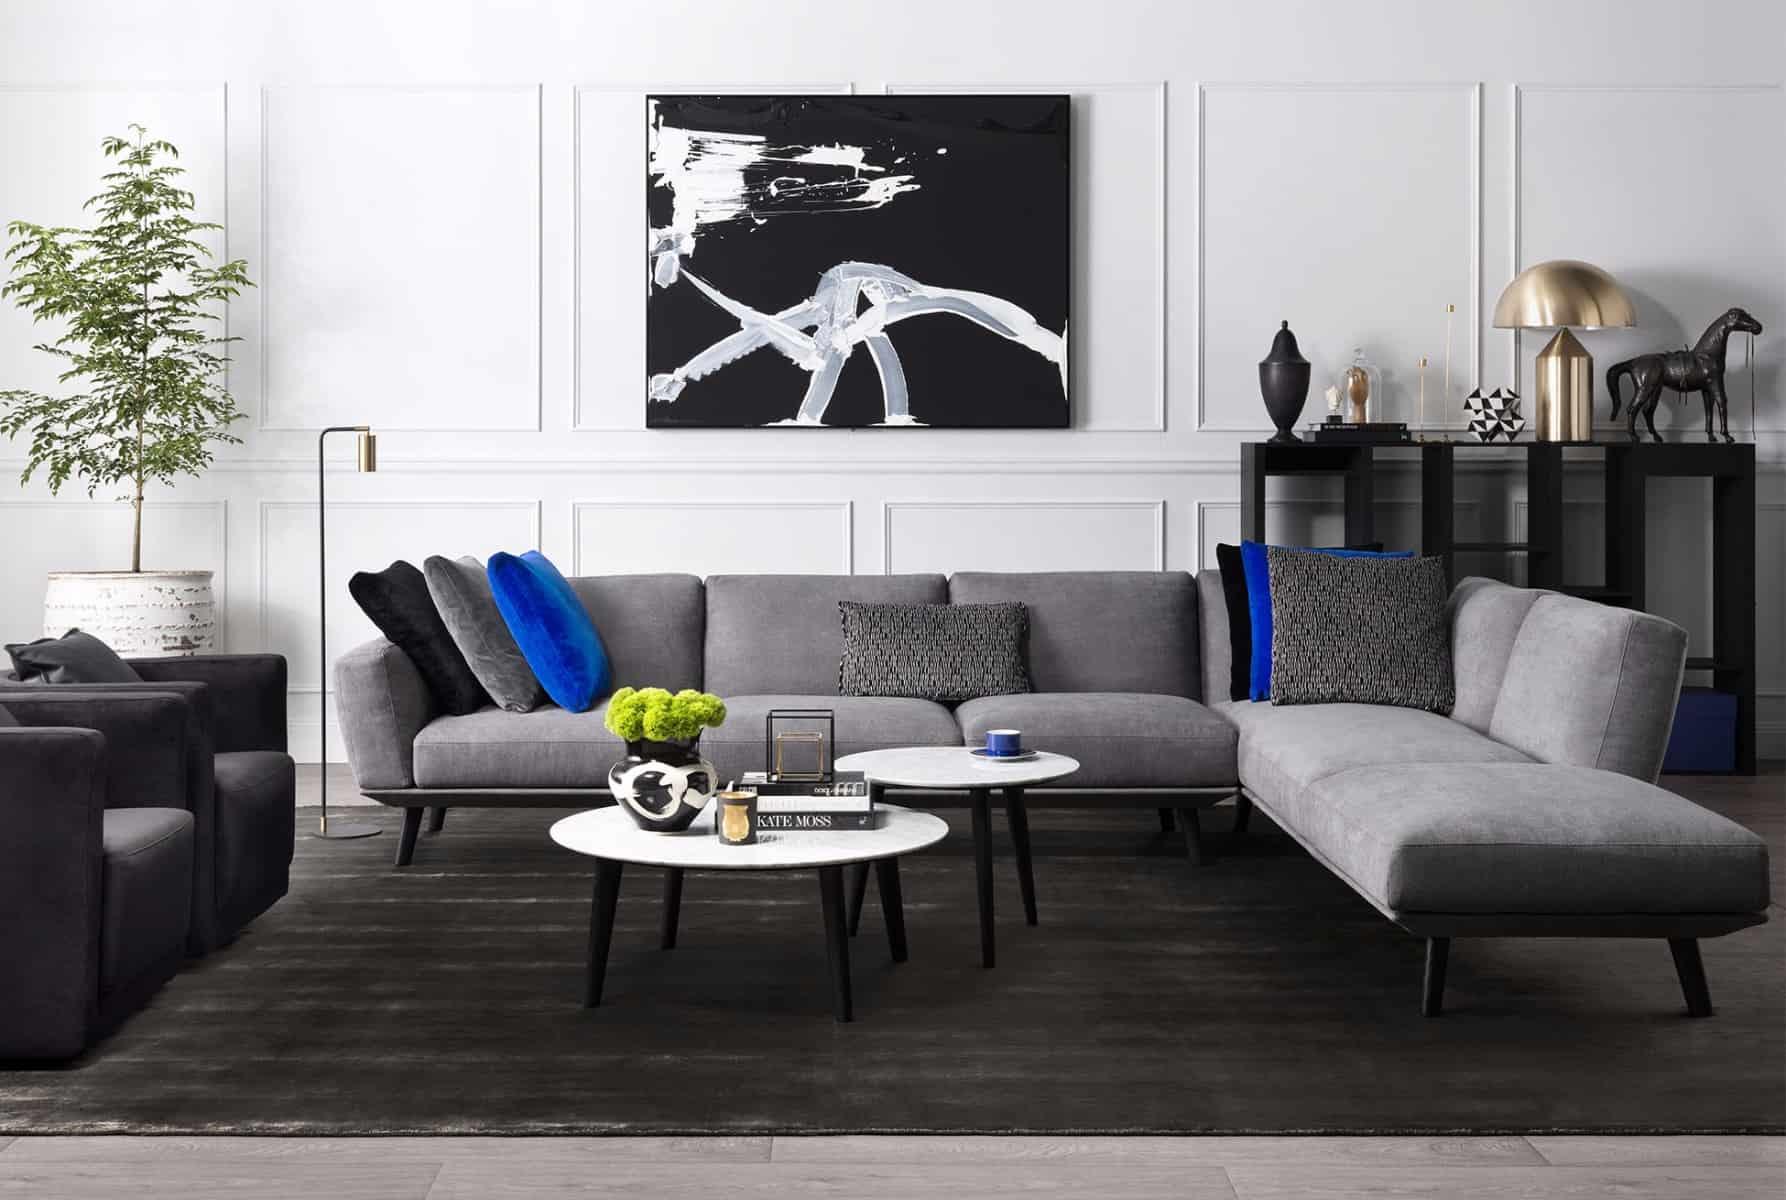 Indoor loft design photo_casartblog